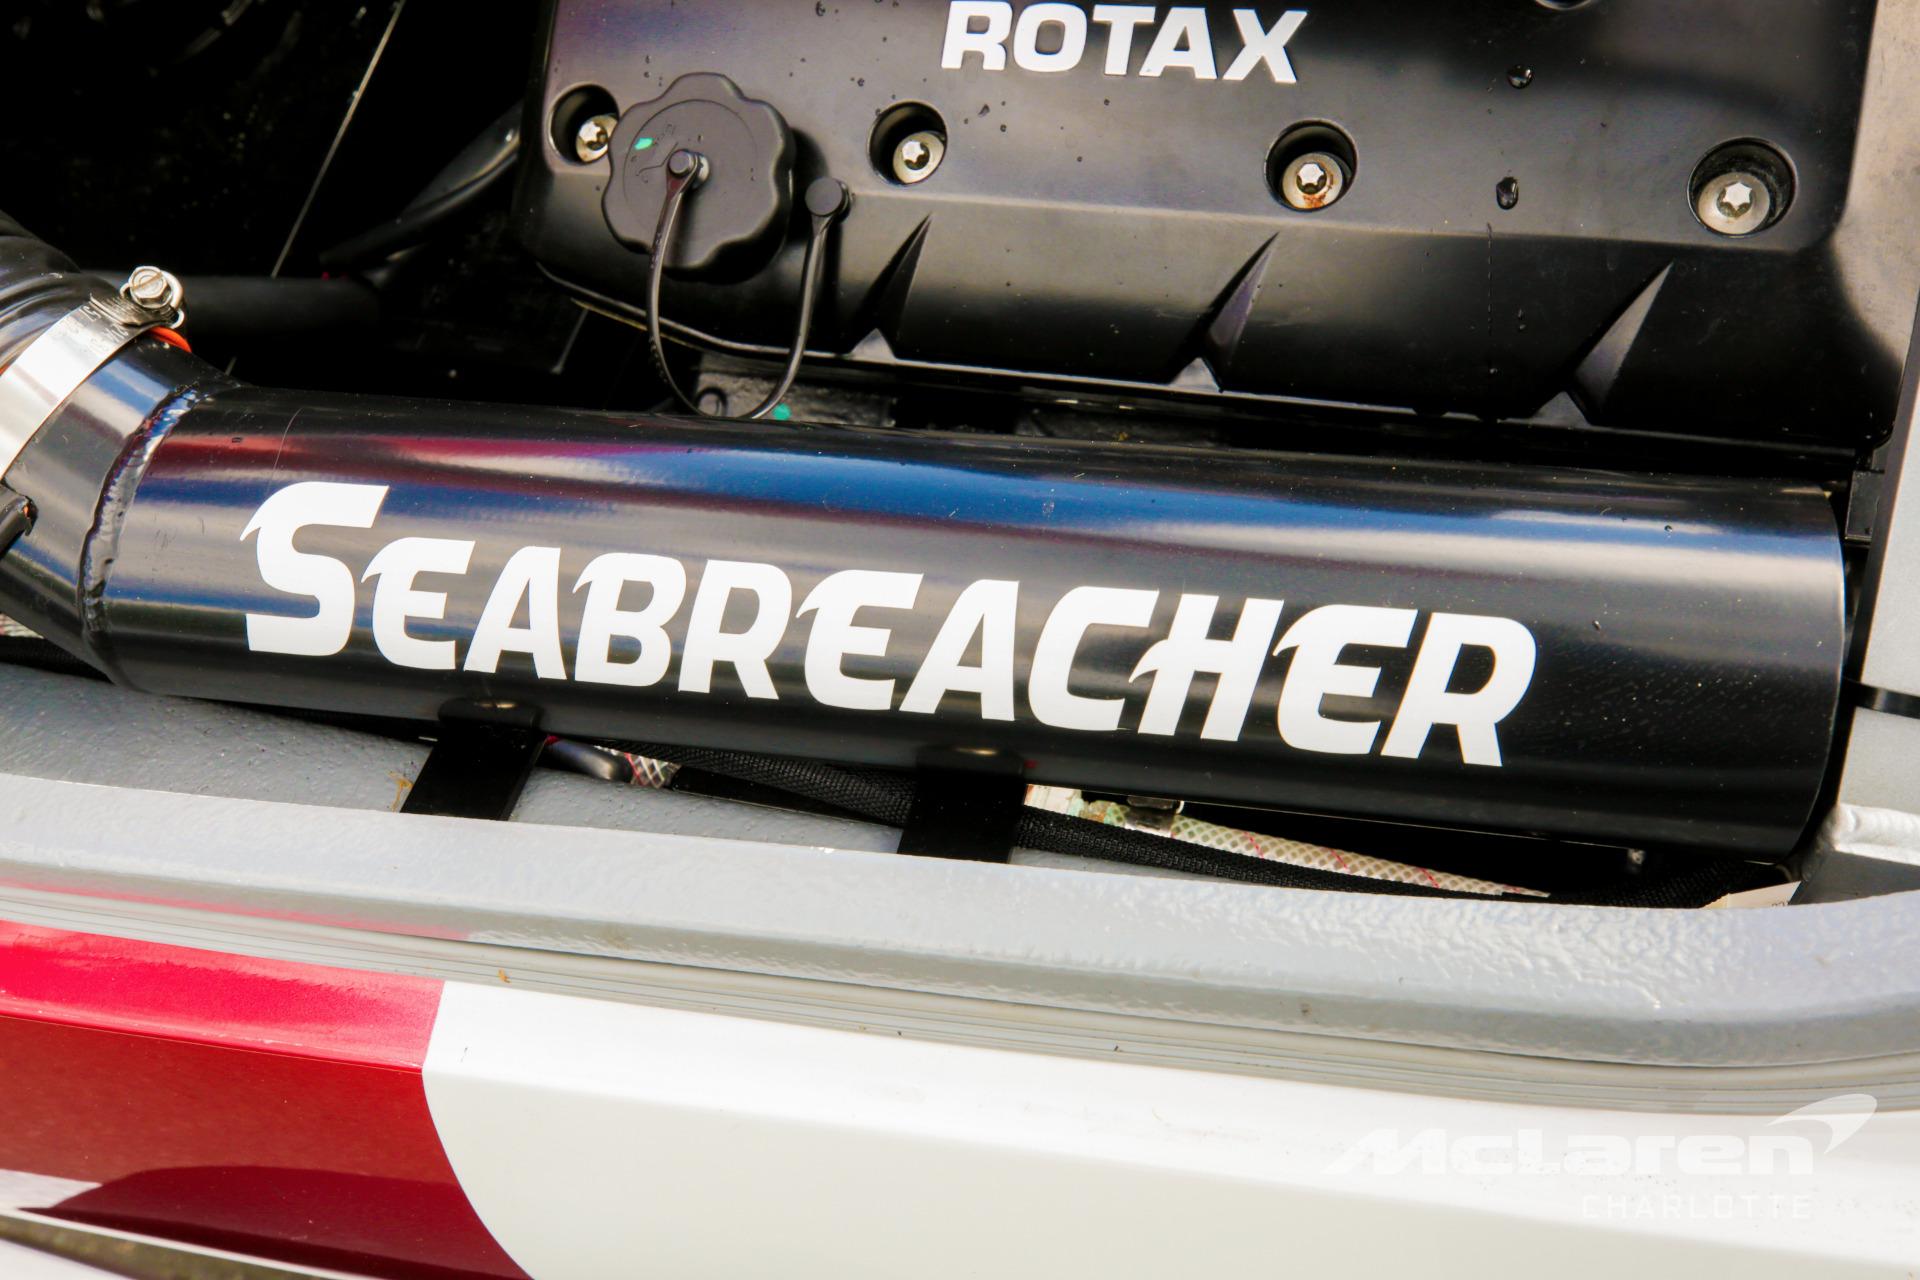 Used 2018 SEABREACHER MODEL X - | Charlotte, NC